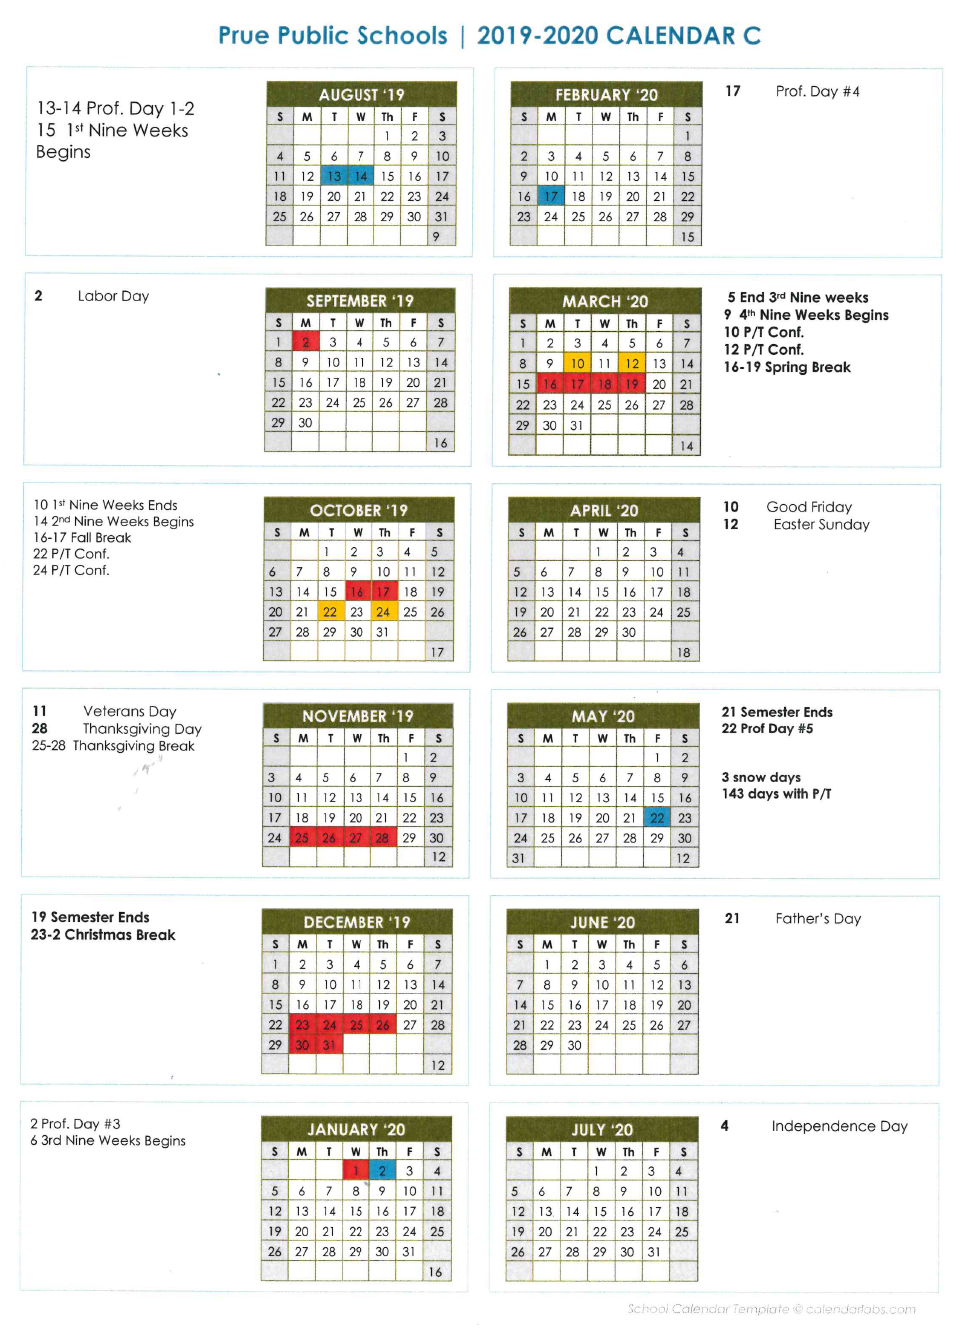 School Calendar – About Us – Prue Public Schools Regarding Broken Arrow Public Schools Calendar